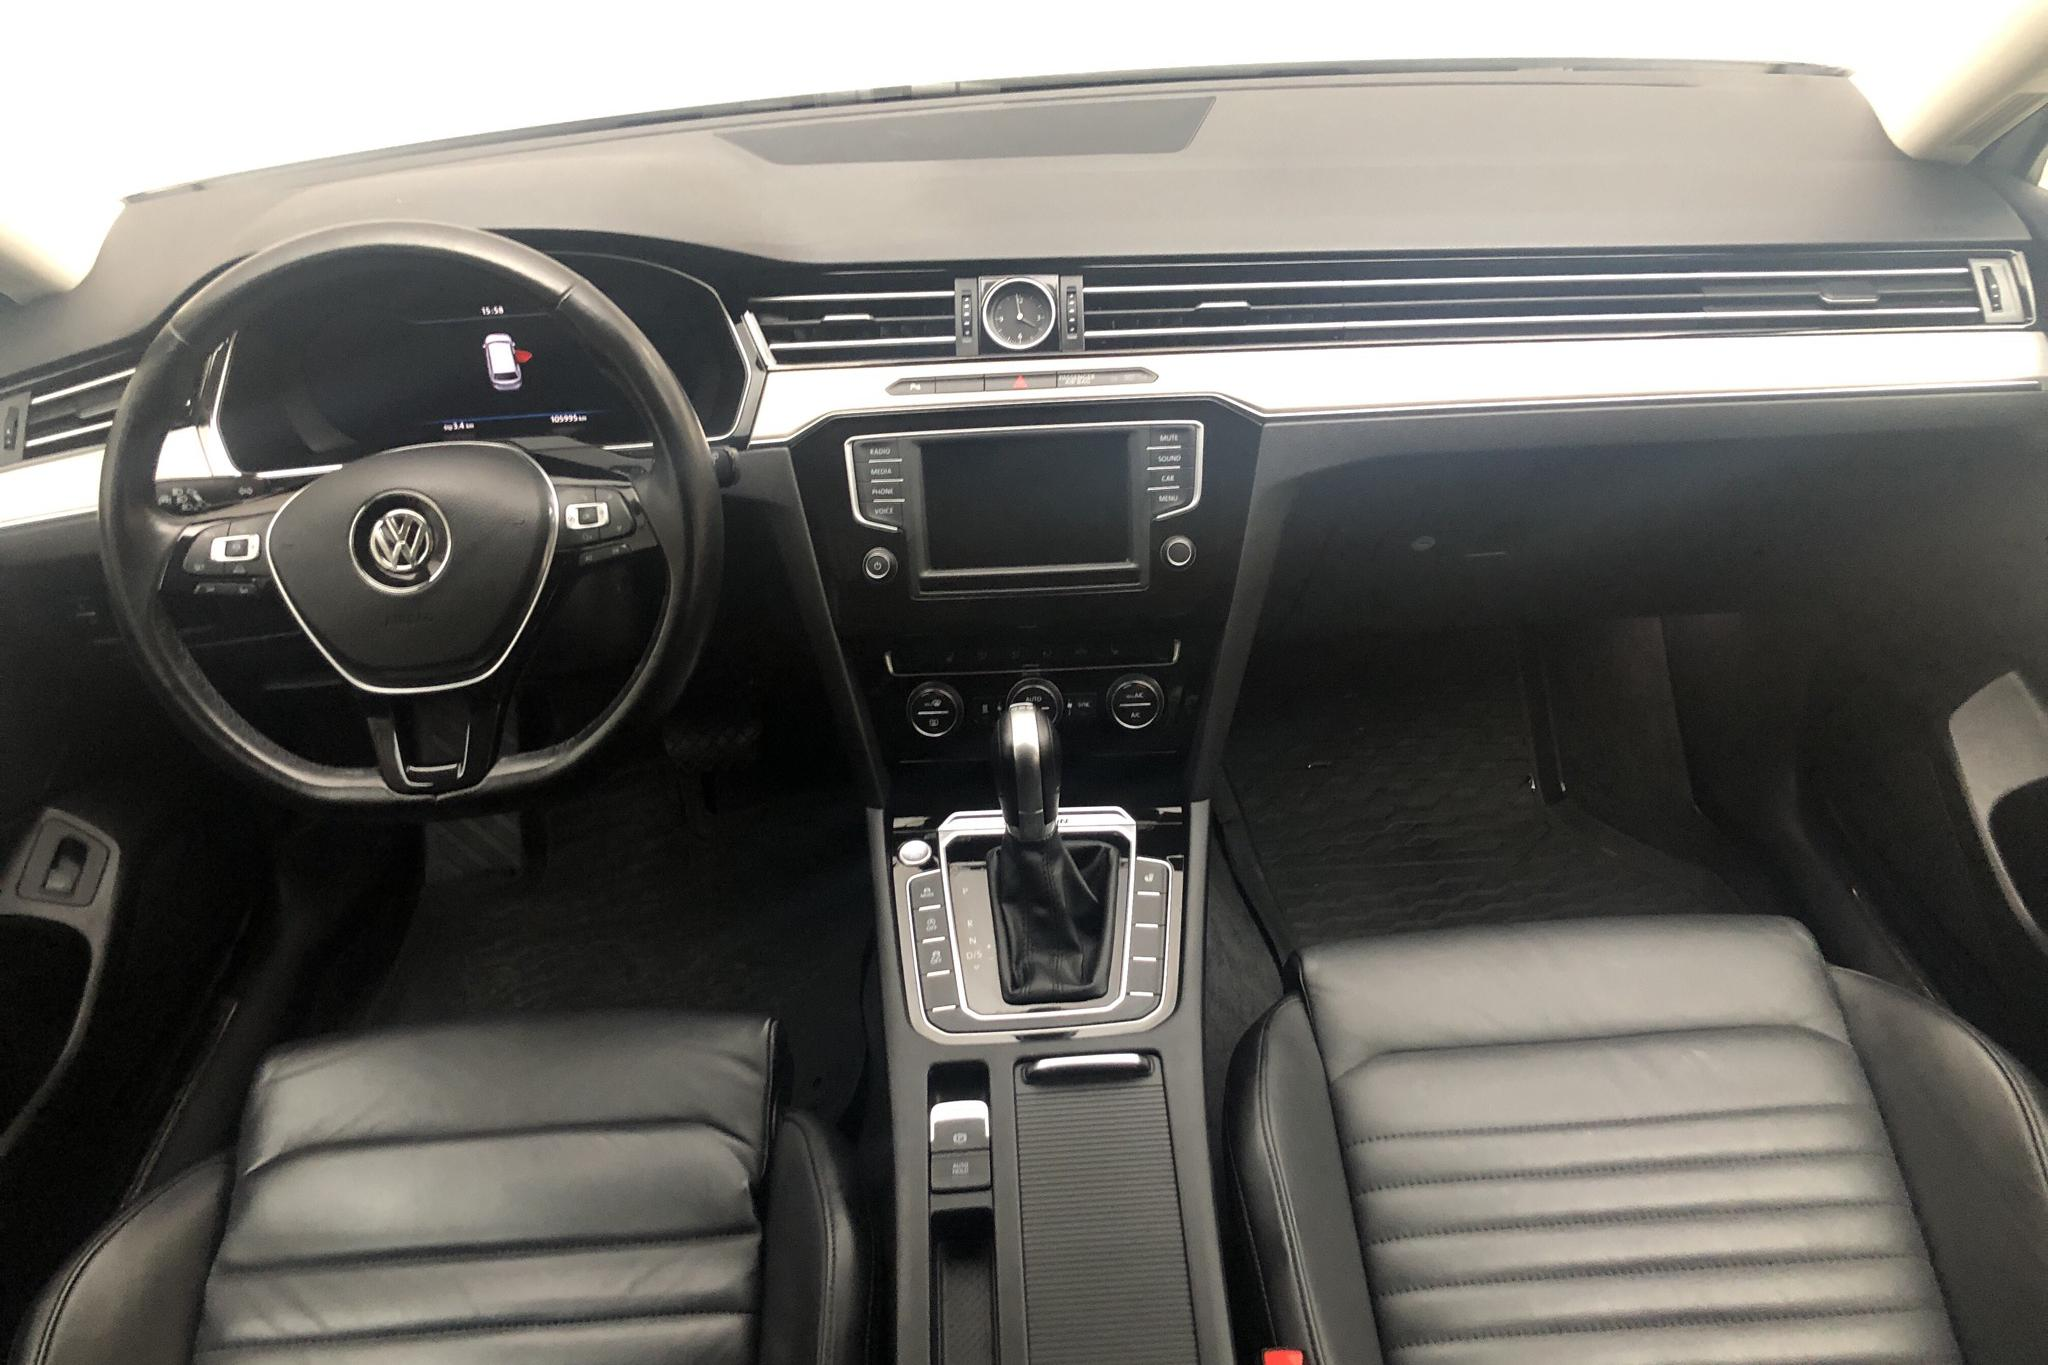 VW Passat 2.0 TDI Sportscombi 4MOTION (190hk) - 105 990 km - Automatic - white - 2017